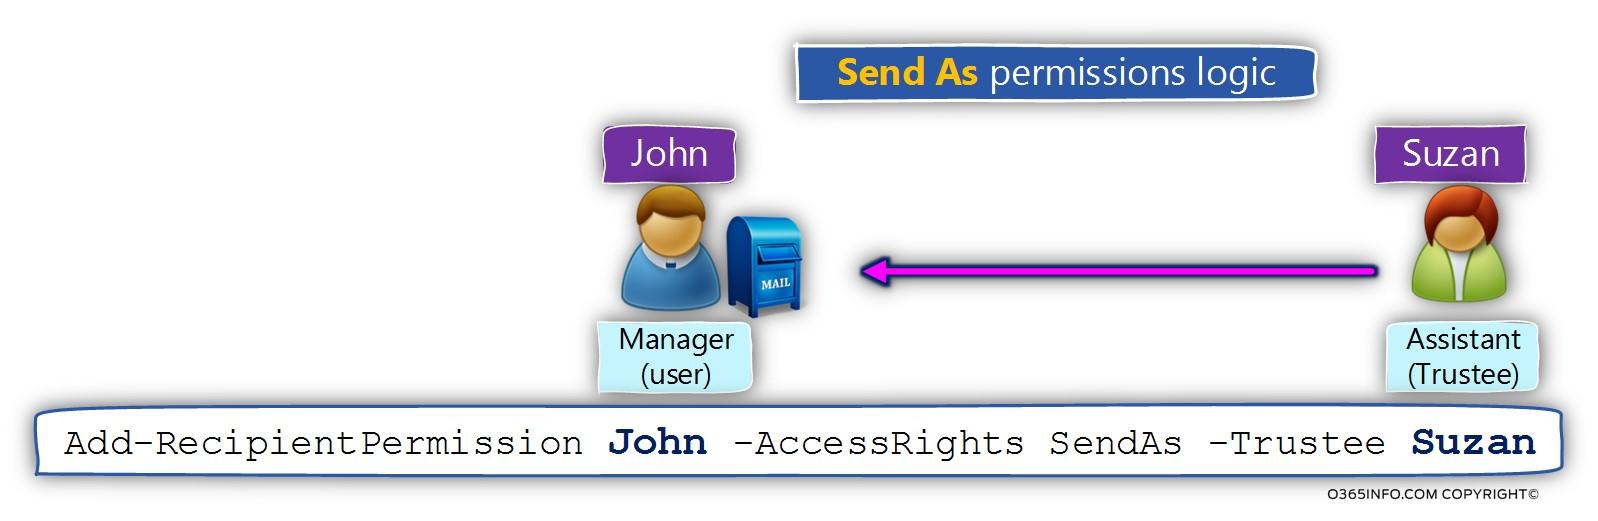 Send As permissions logic -01